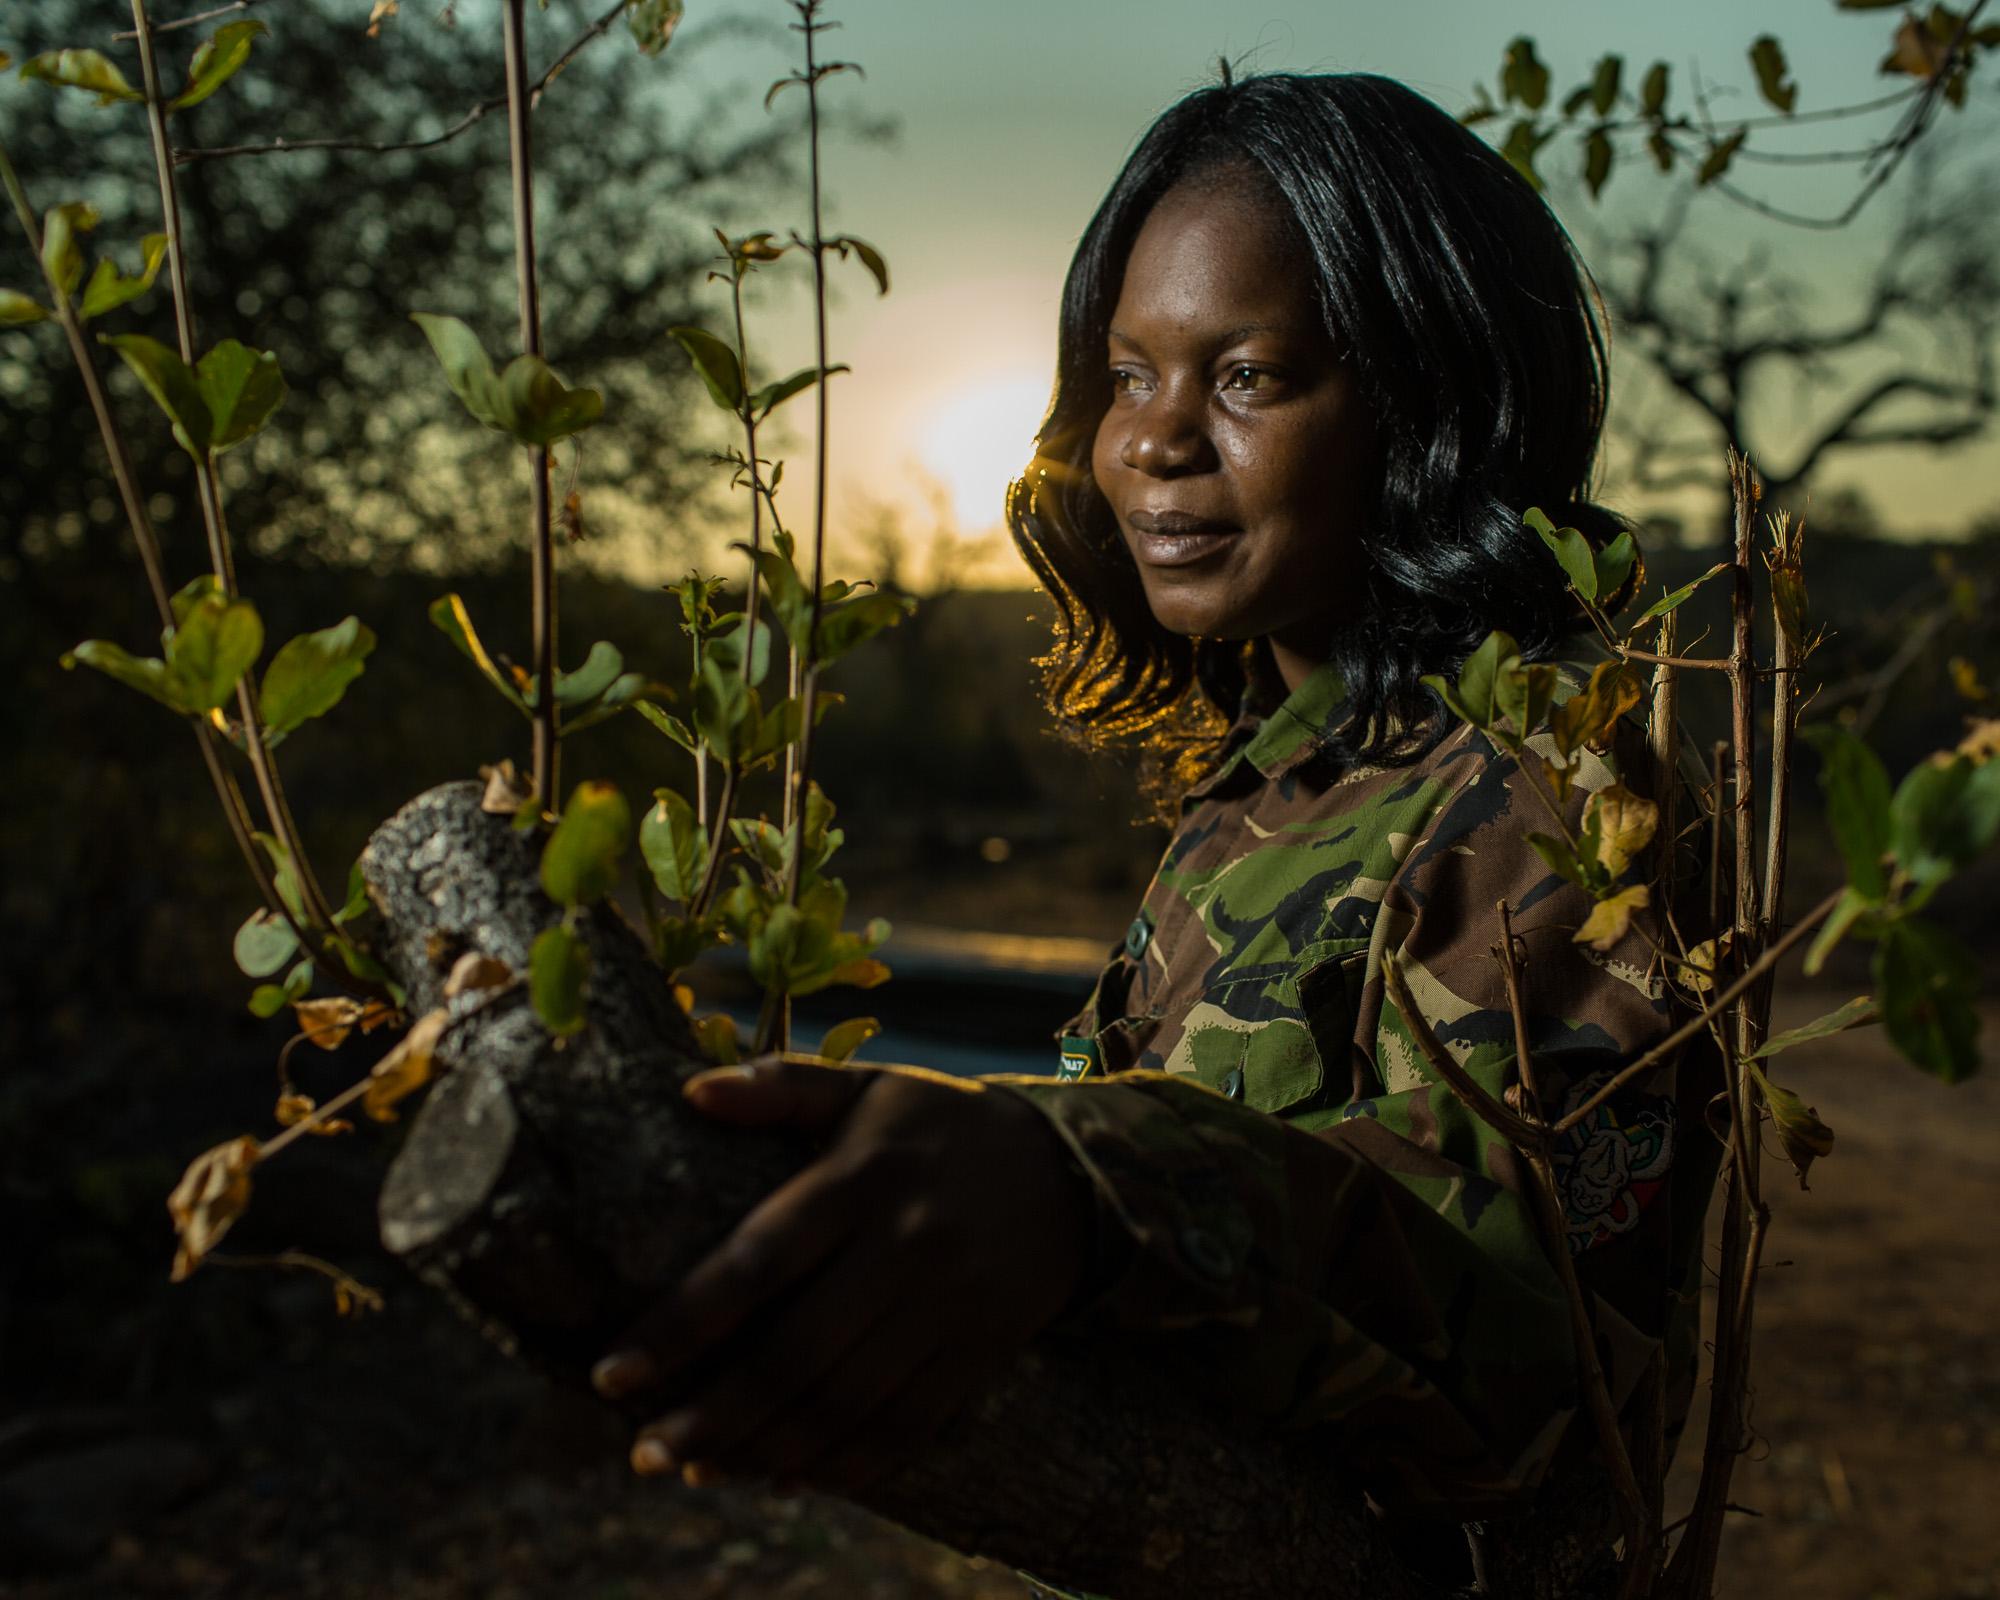 Winny Nyathi,a member of the Black Mamba anti-poaching unit in Balule Game Reserve.